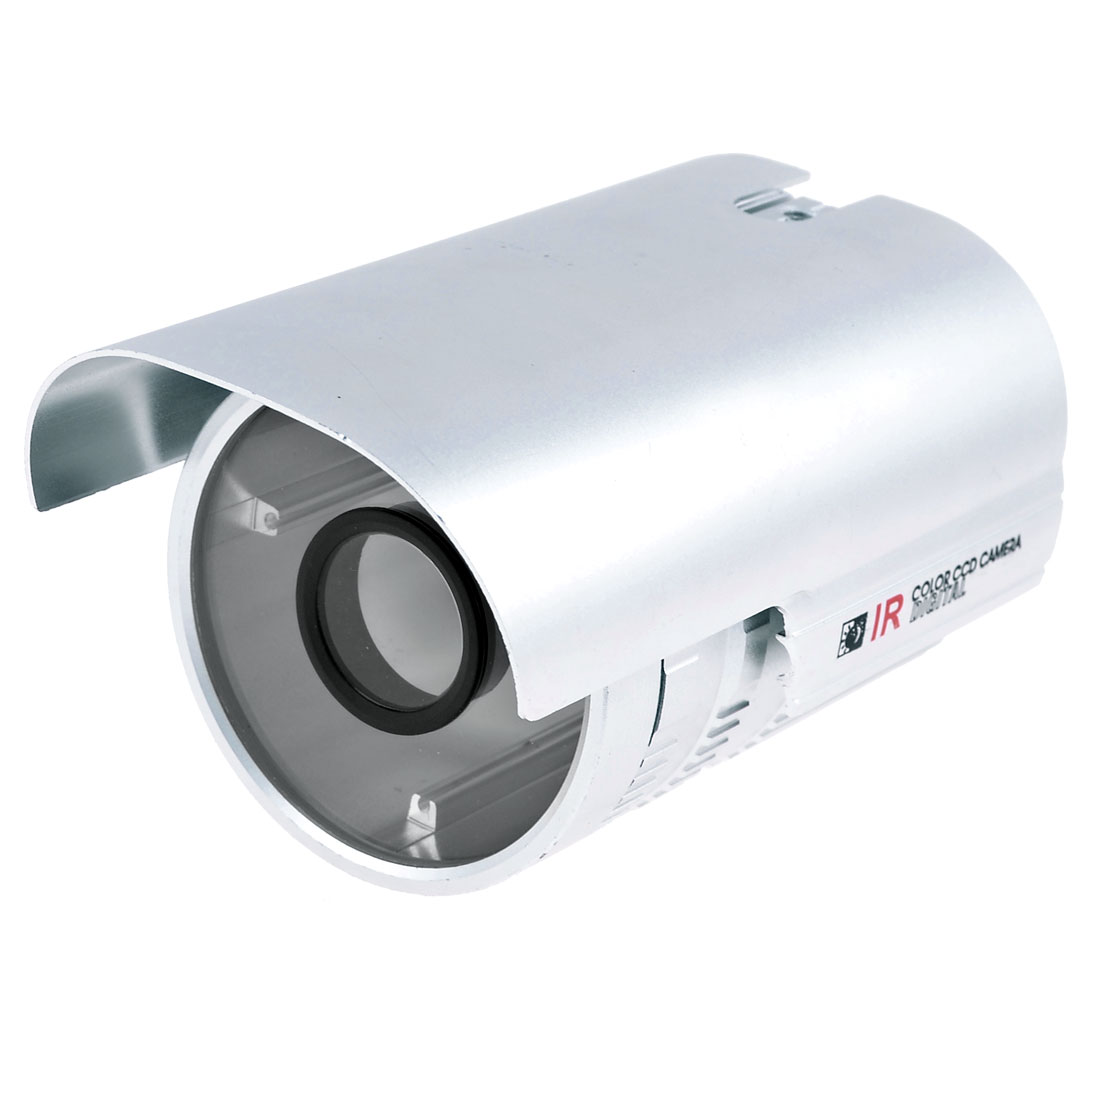 "6"" Outdoor Weatherproof CCTV IP IR Camera Housing Enclosure Protector Silver Tone"